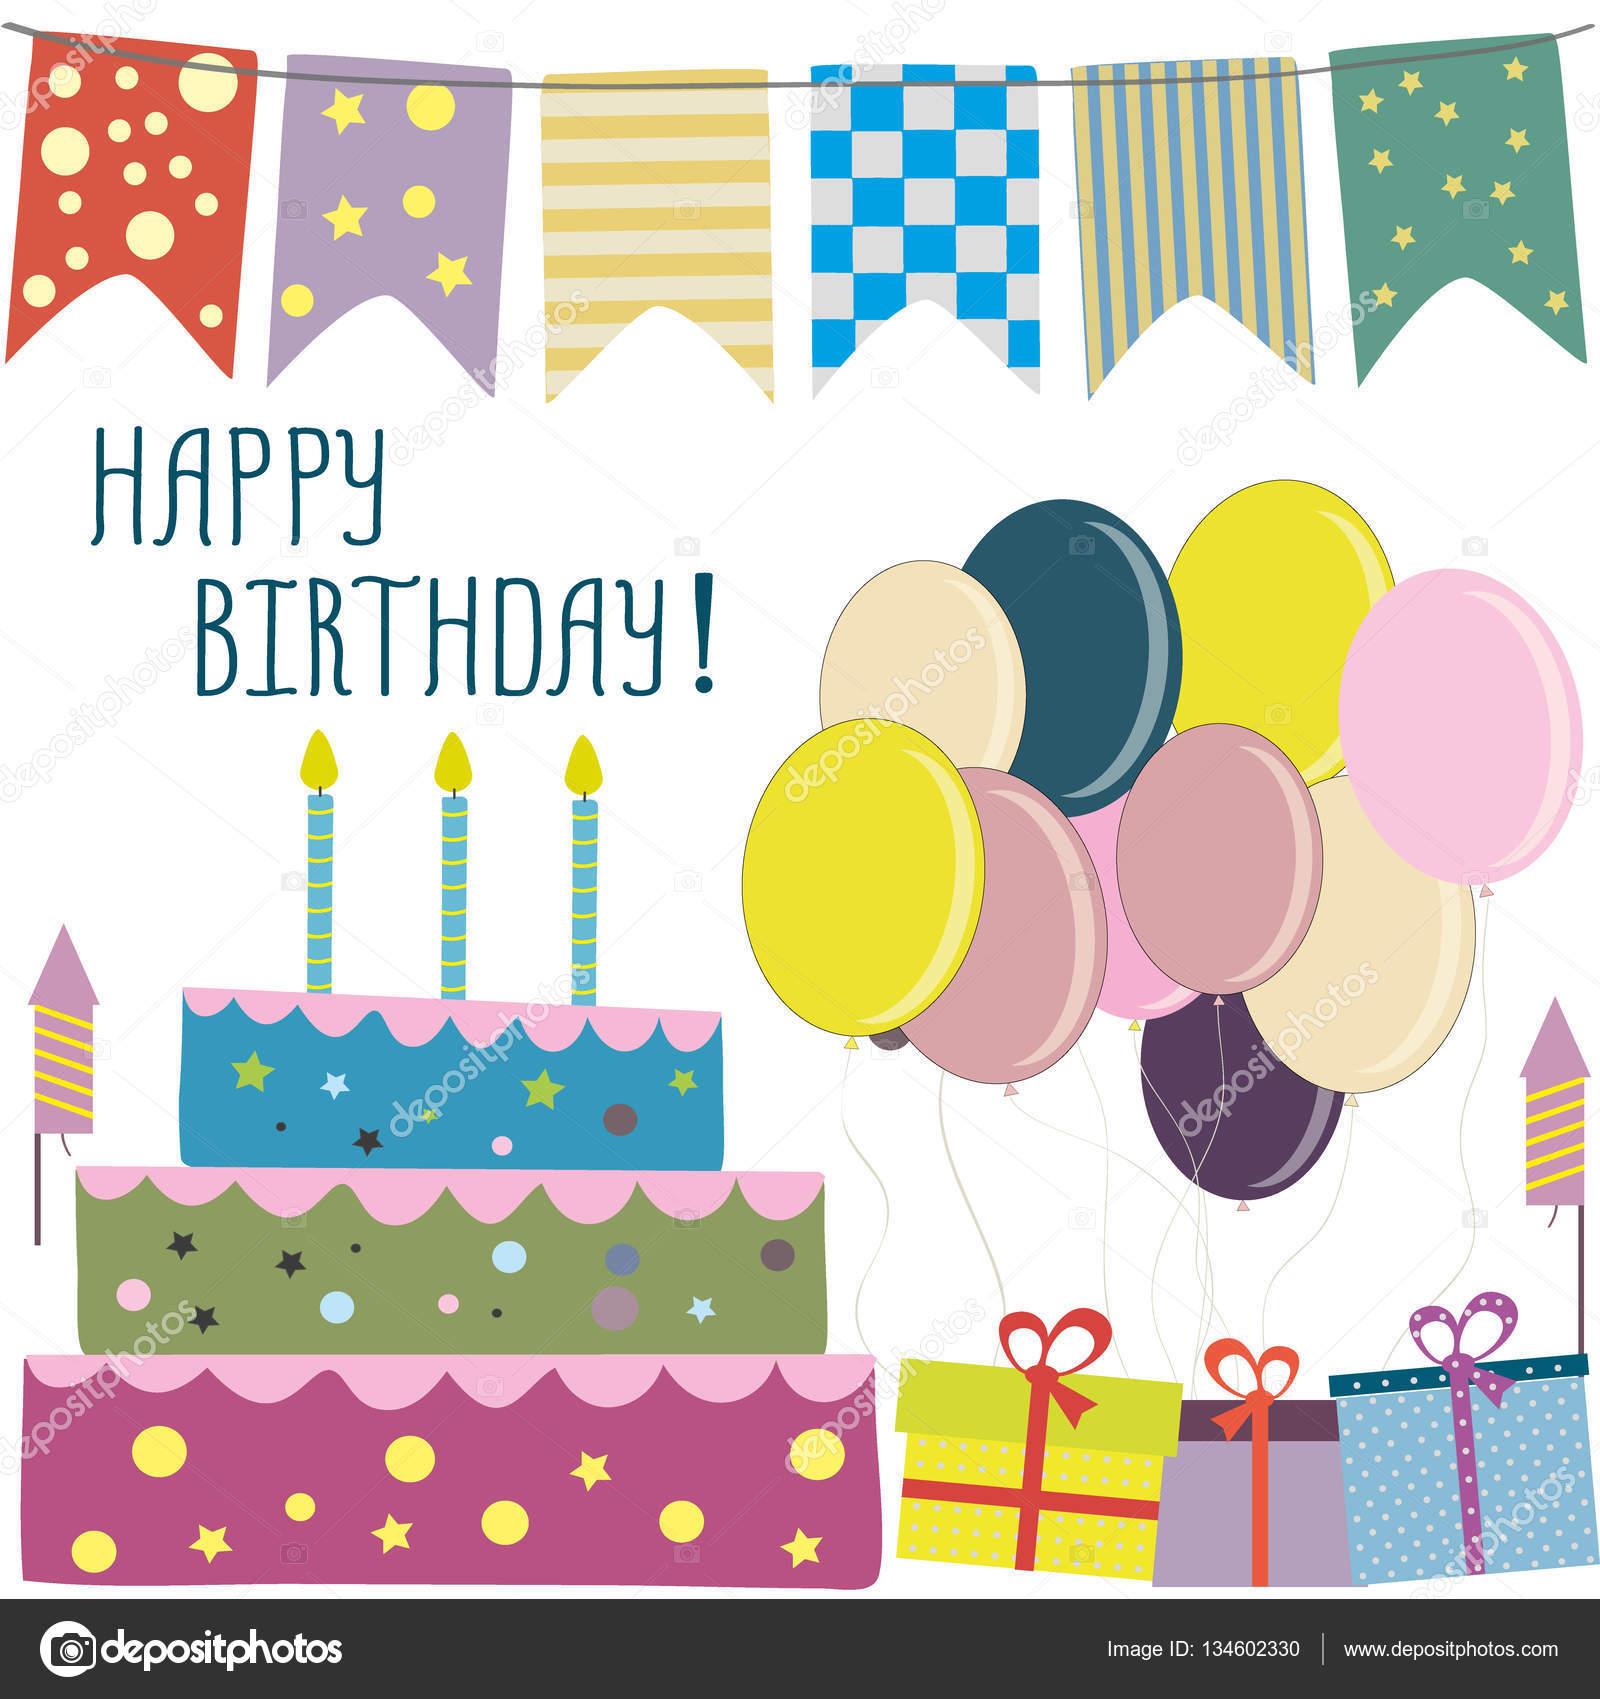 Happy birthday card flags cake ts balloons — Stock Vector